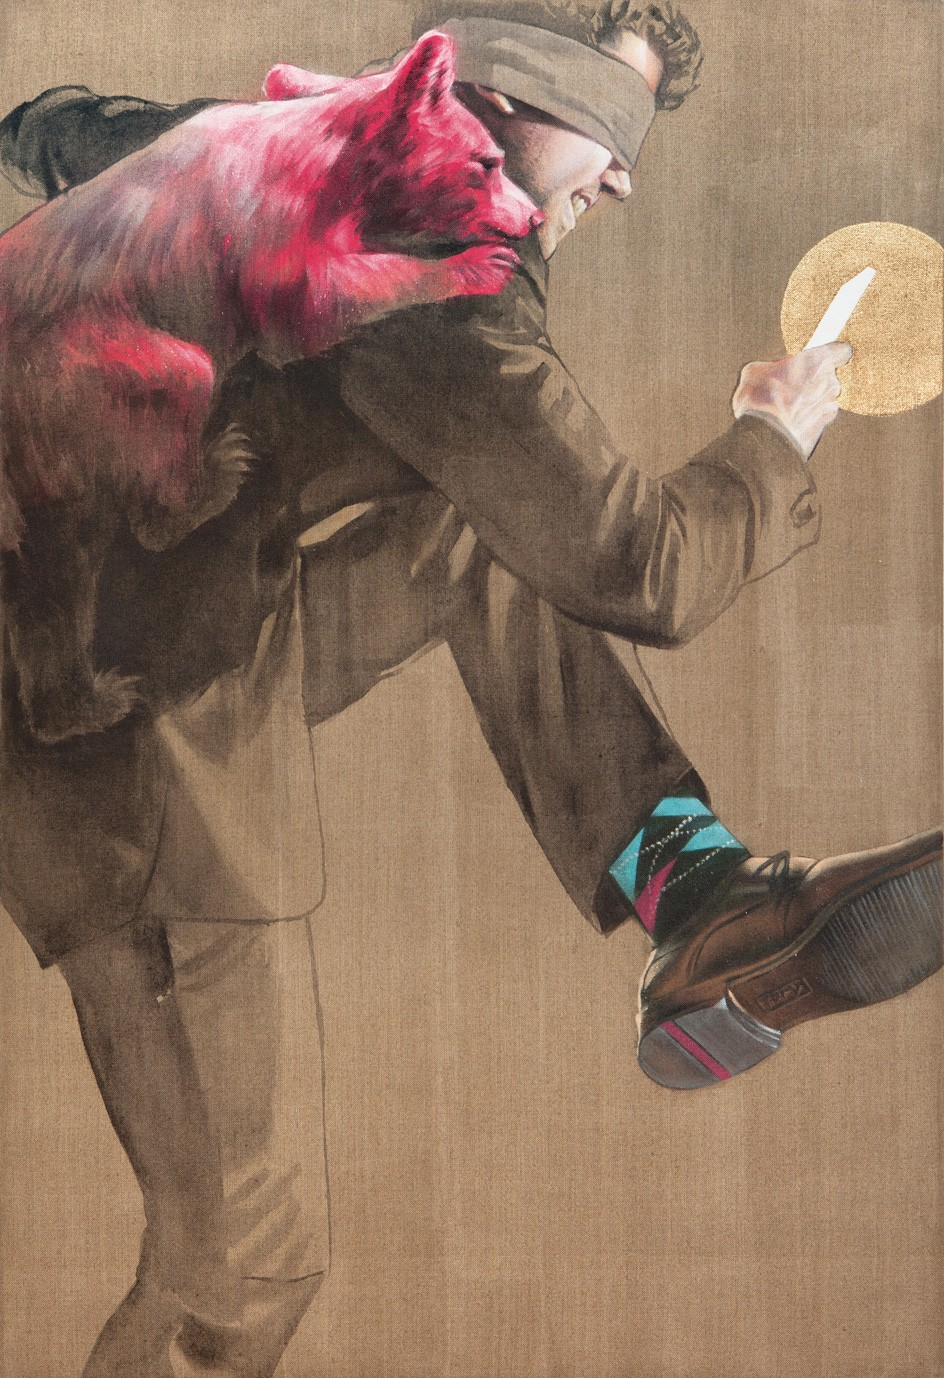 Schrittmacher | Malerei von Jakob Tory Bardou, innerfields | Acryl auf Leinwand, Urban Art